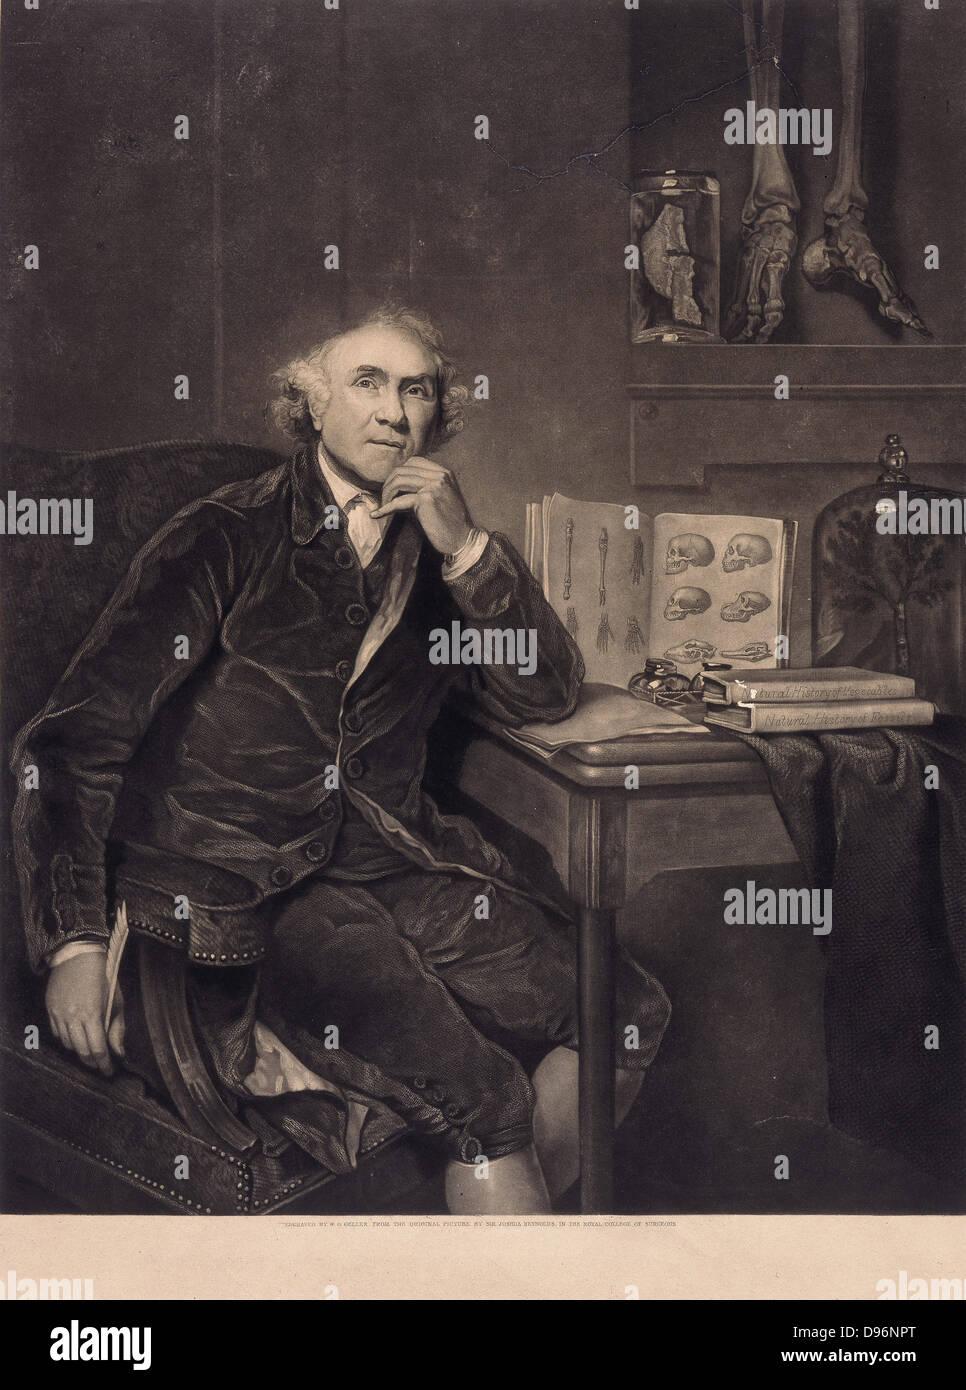 John Hunter (1728-1793) Scottish anatomist, physiologist and surgeon who applied scientific method to medicine. - Stock Image